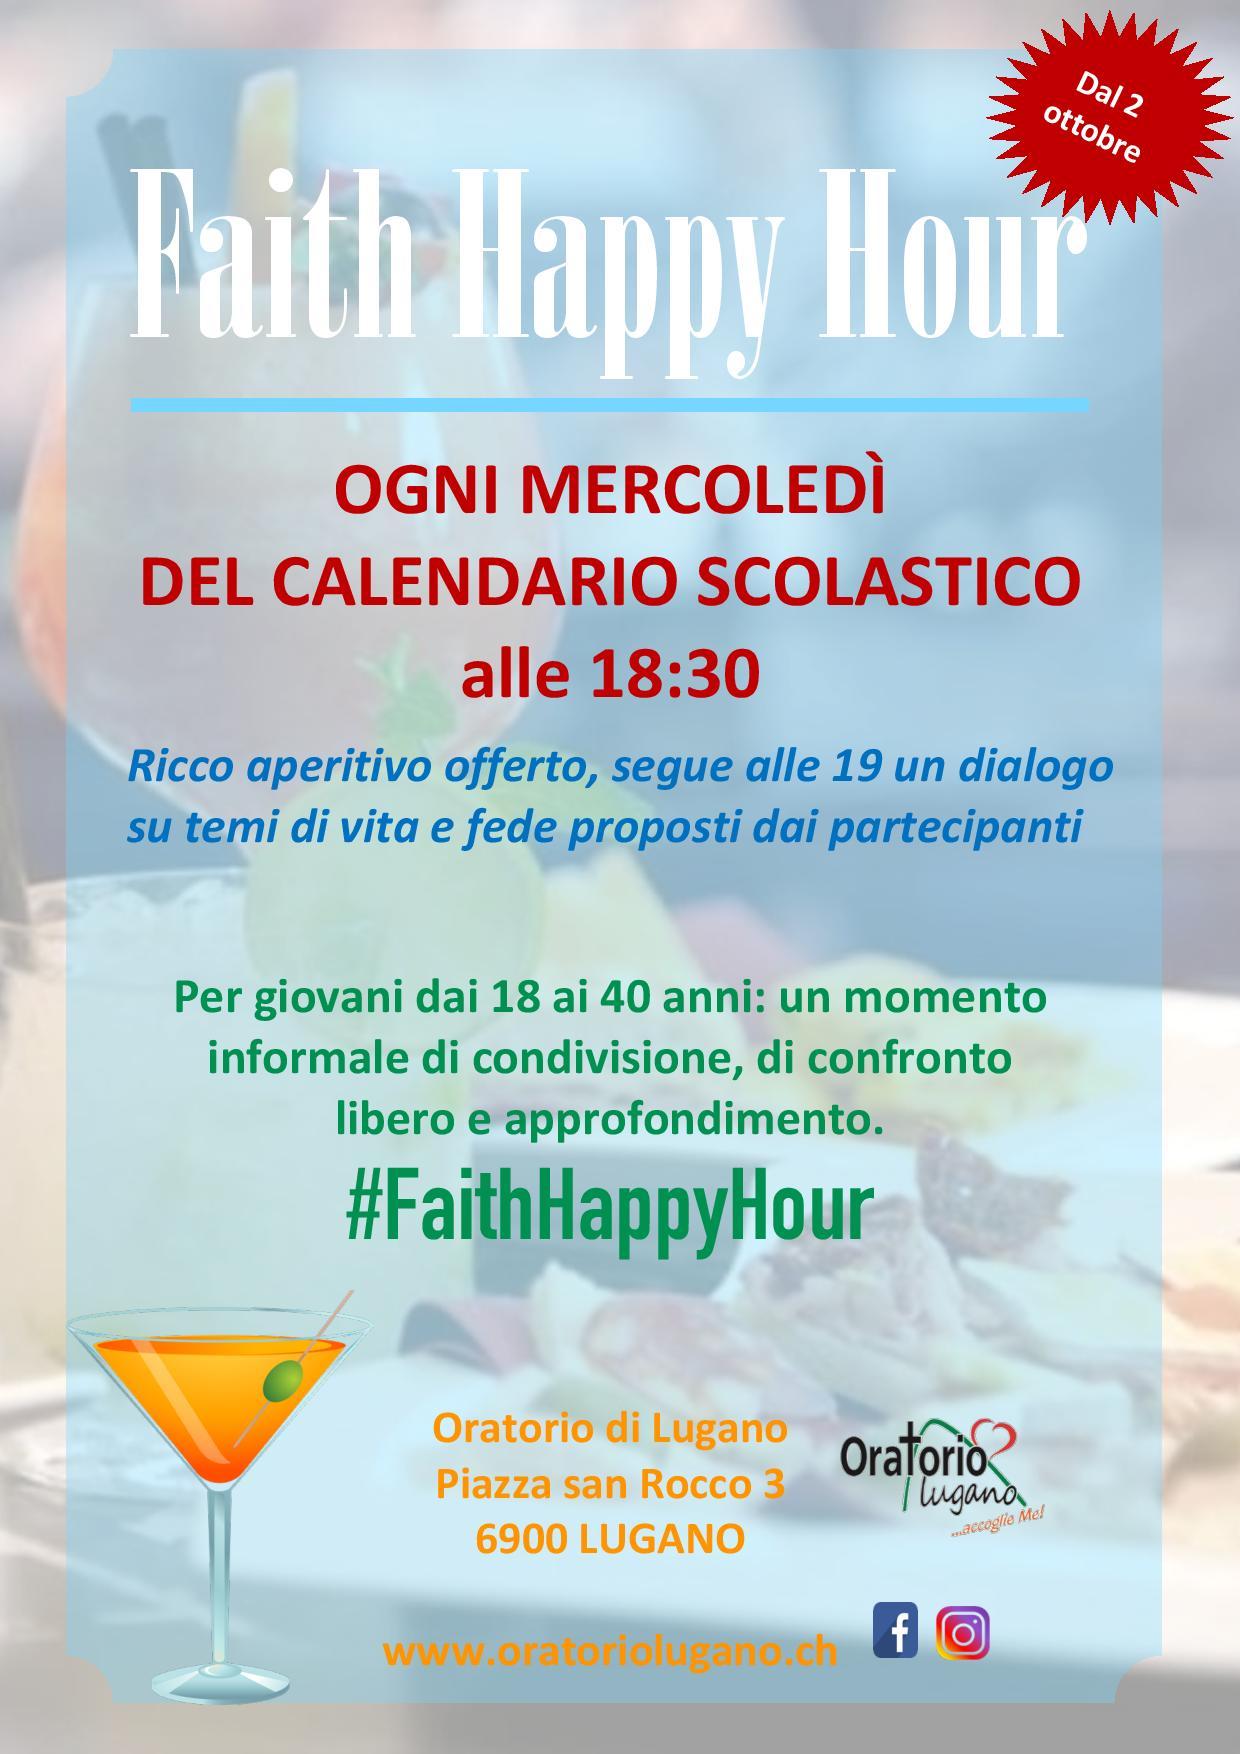 Faith Happy Hour locandina-page-001